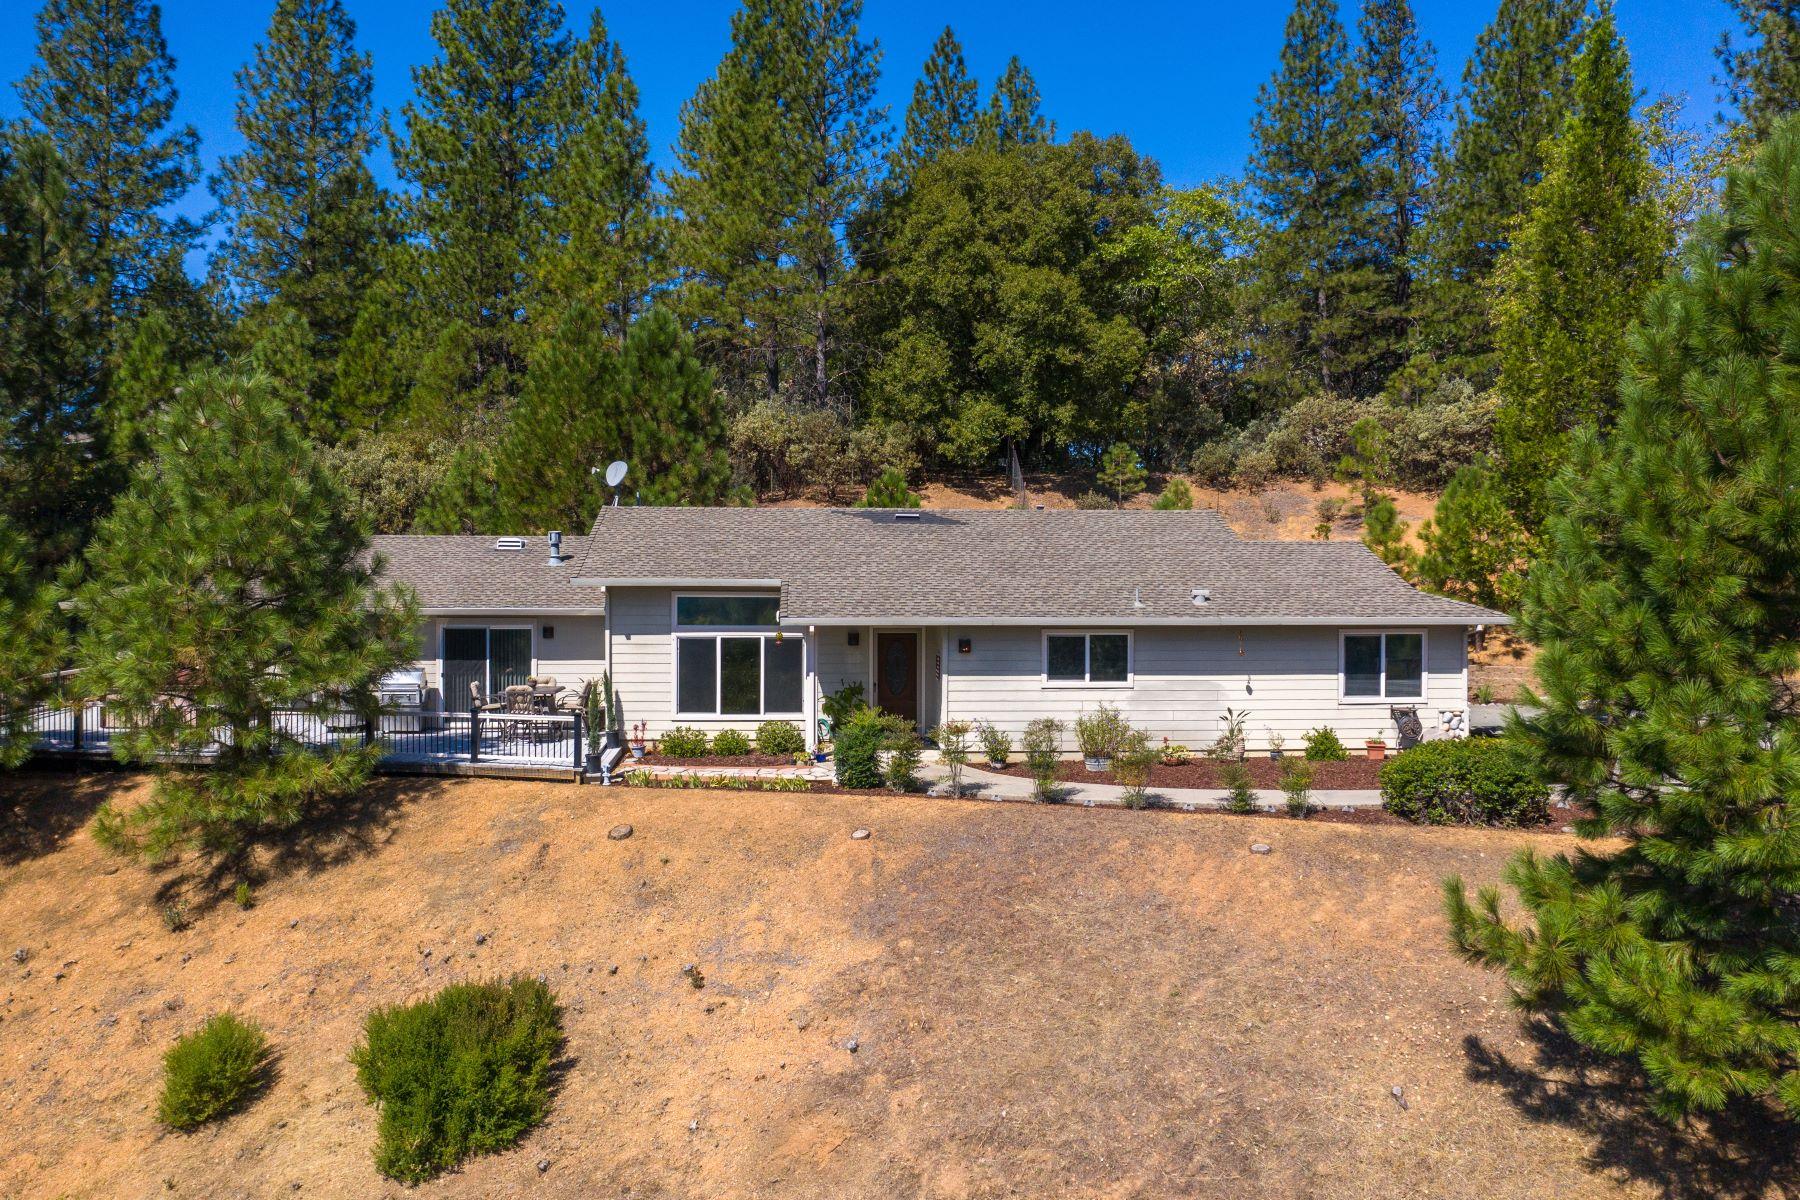 Single Family Homes 为 销售 在 20153 Brushy Ridge Trl, Weimar, CA 95713 20153 Brushy Ridge Trl Weimar, 加利福尼亚州 95713 美国